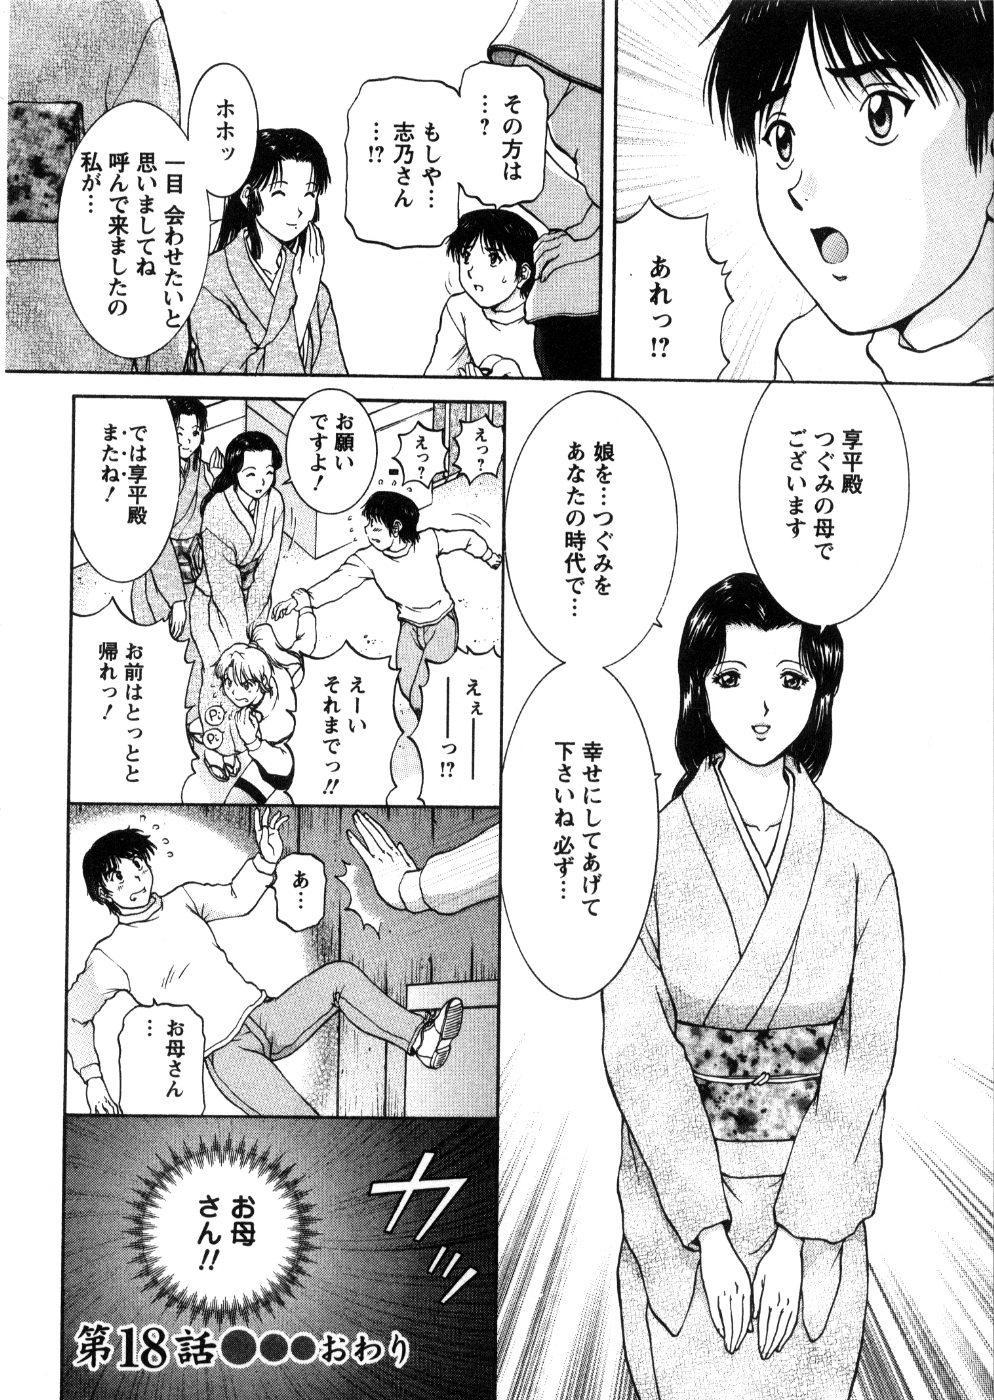 Oneechan-tachi ga Yatte Kuru 03 47